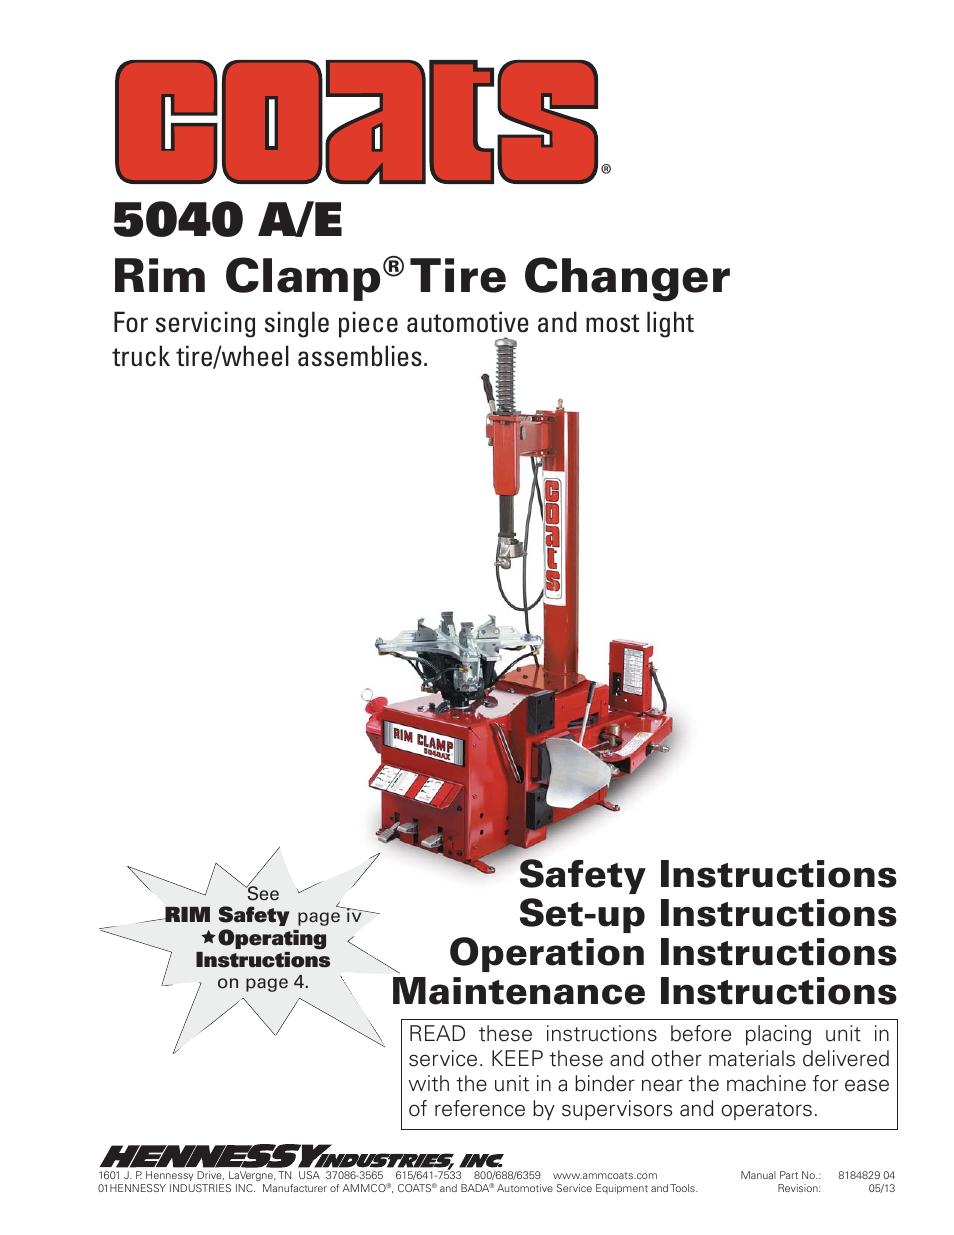 coats 5040 a e tire changer user manual 28 pages rh manualsdir com Ammco Tools Inc Ammco Brake Tools